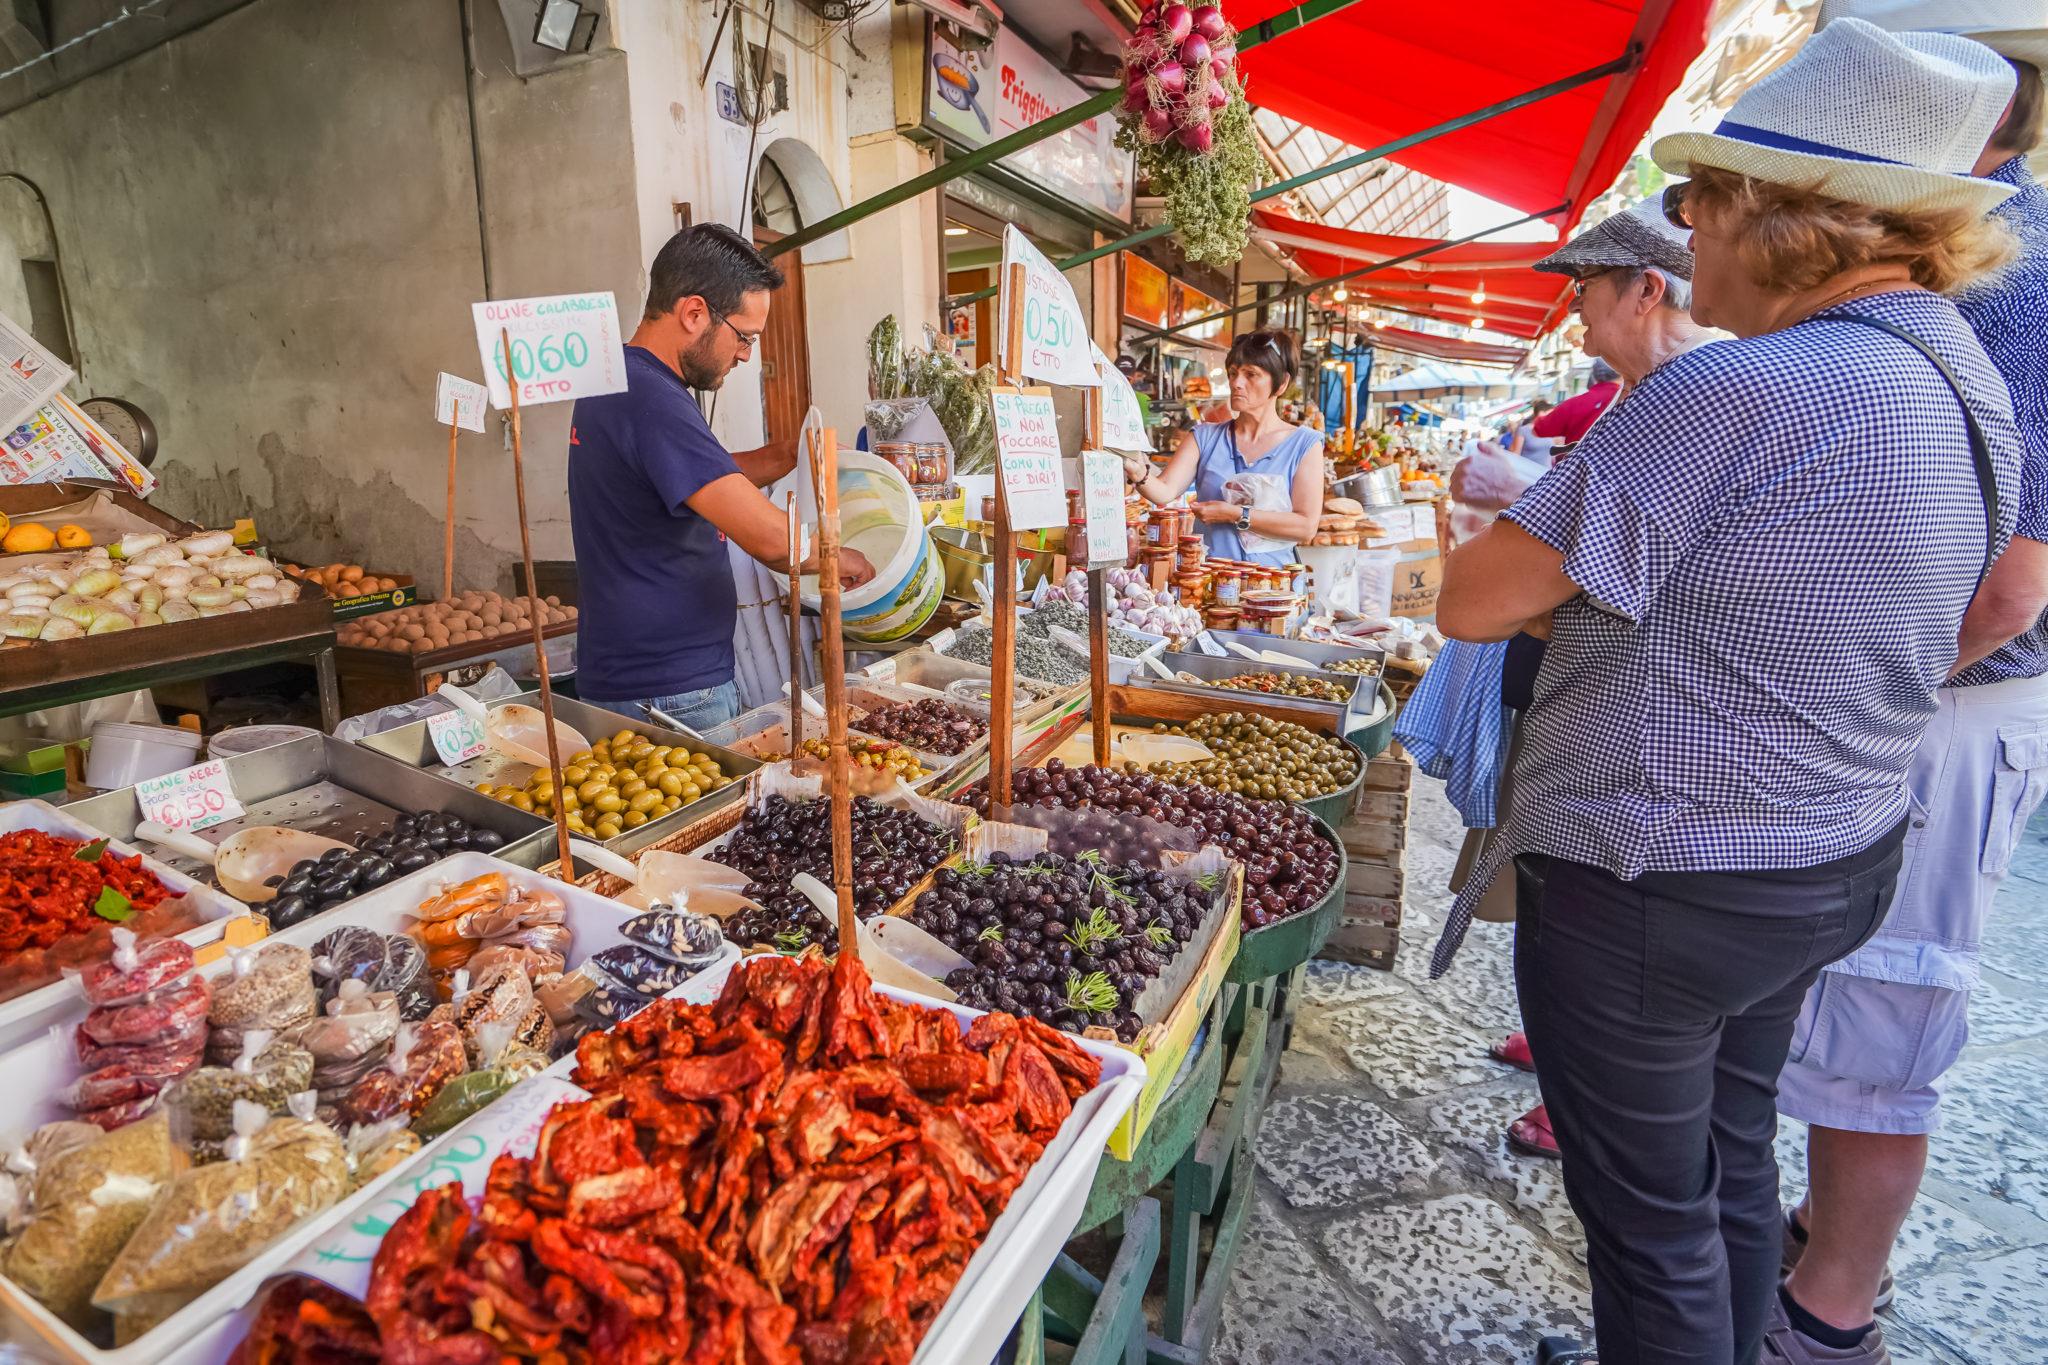 Mercato-capo-marché-palerme-sicile-italie